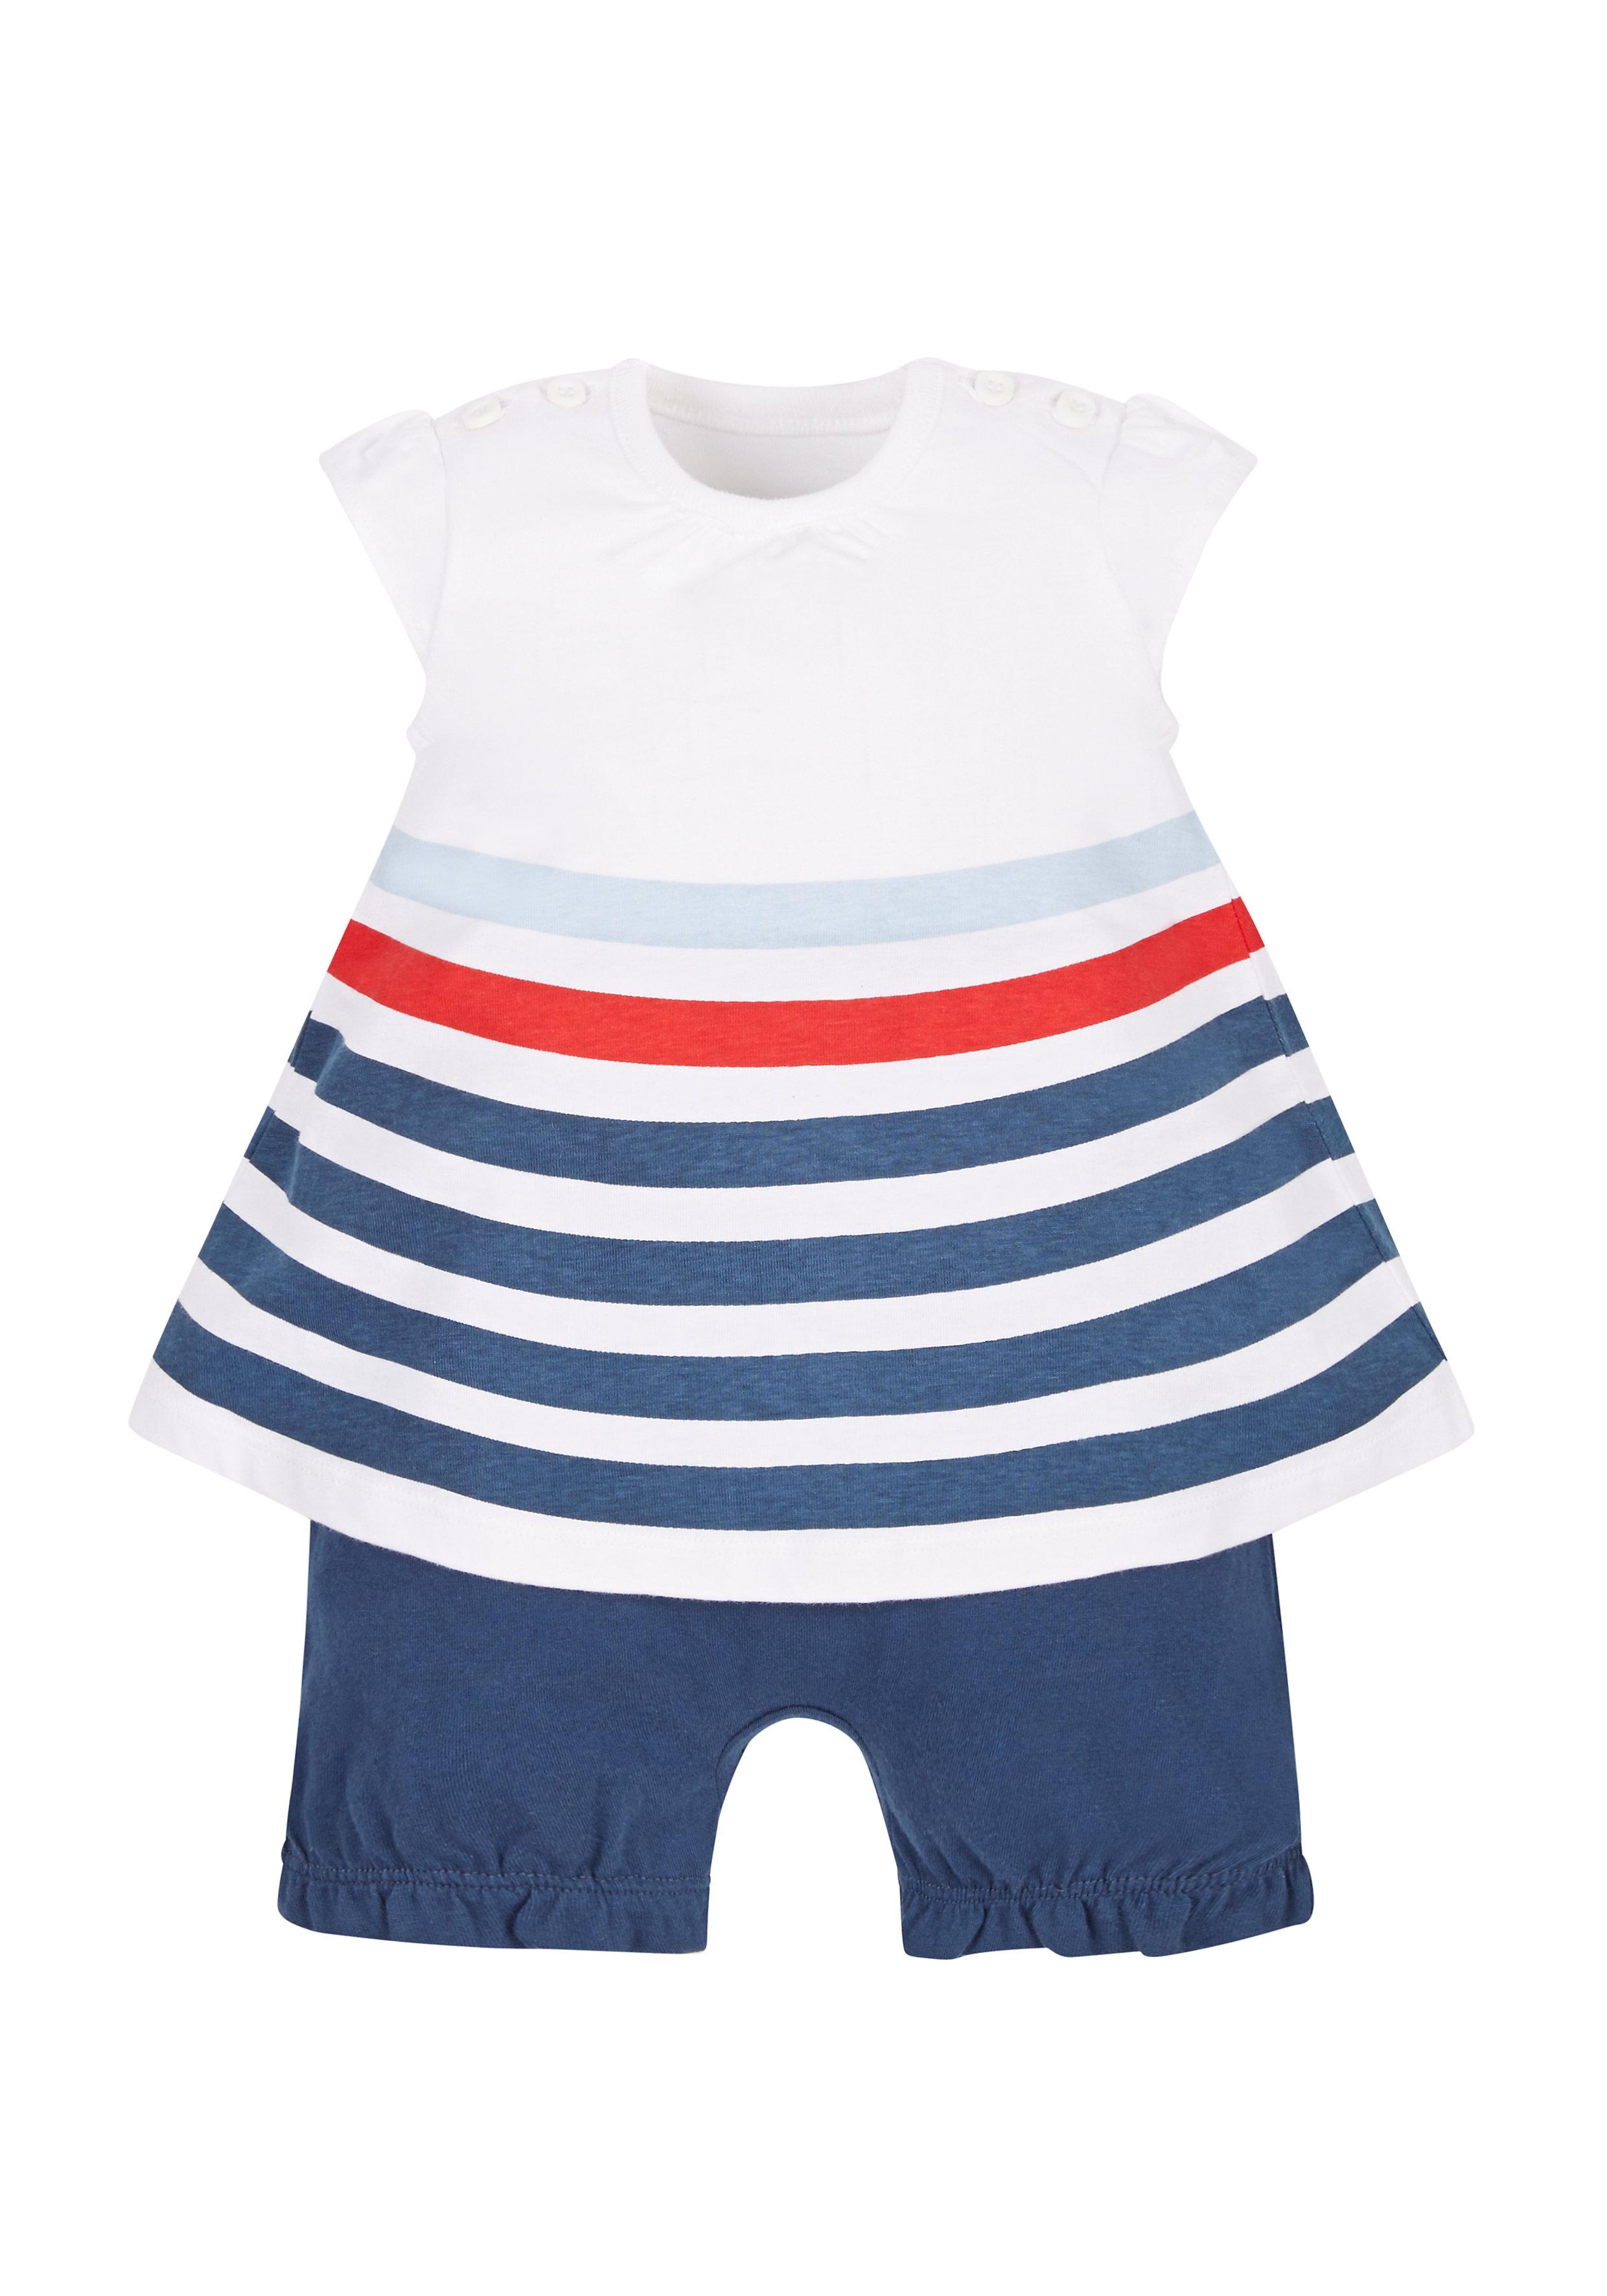 Mothercare   Girls Stripy Bloomer Romper - Navy